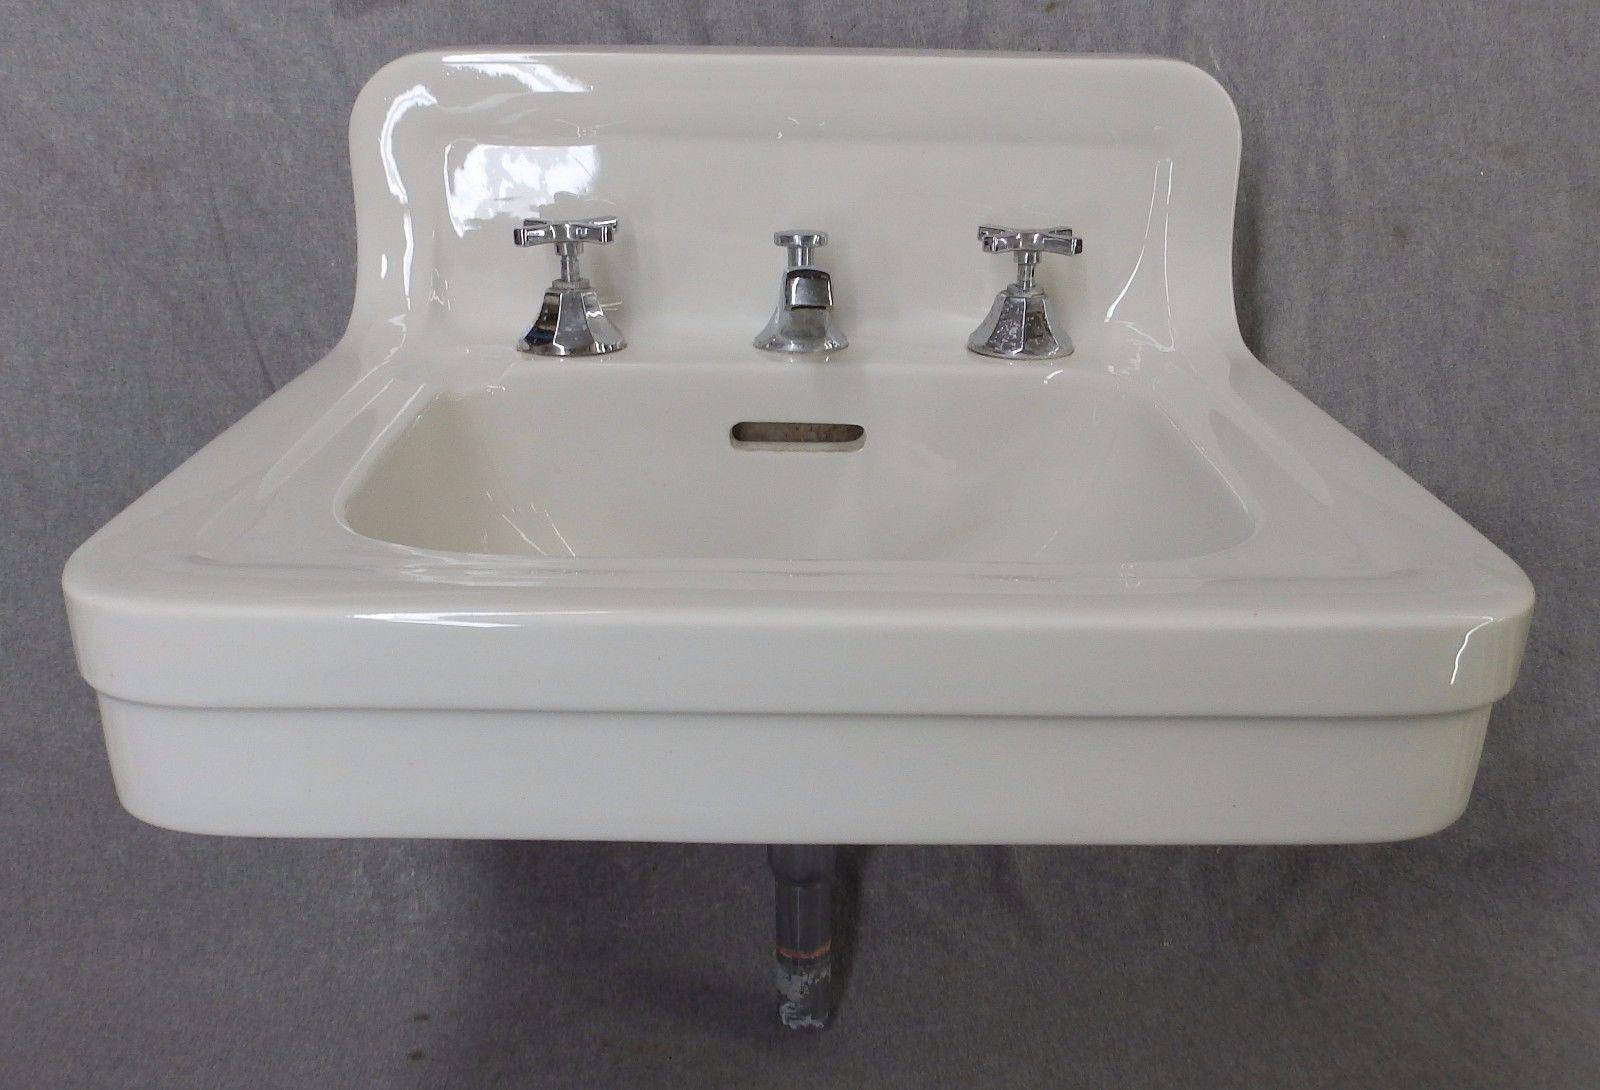 Antique White Porcelain Ceramic Bathroom Wall Sink Old Crane